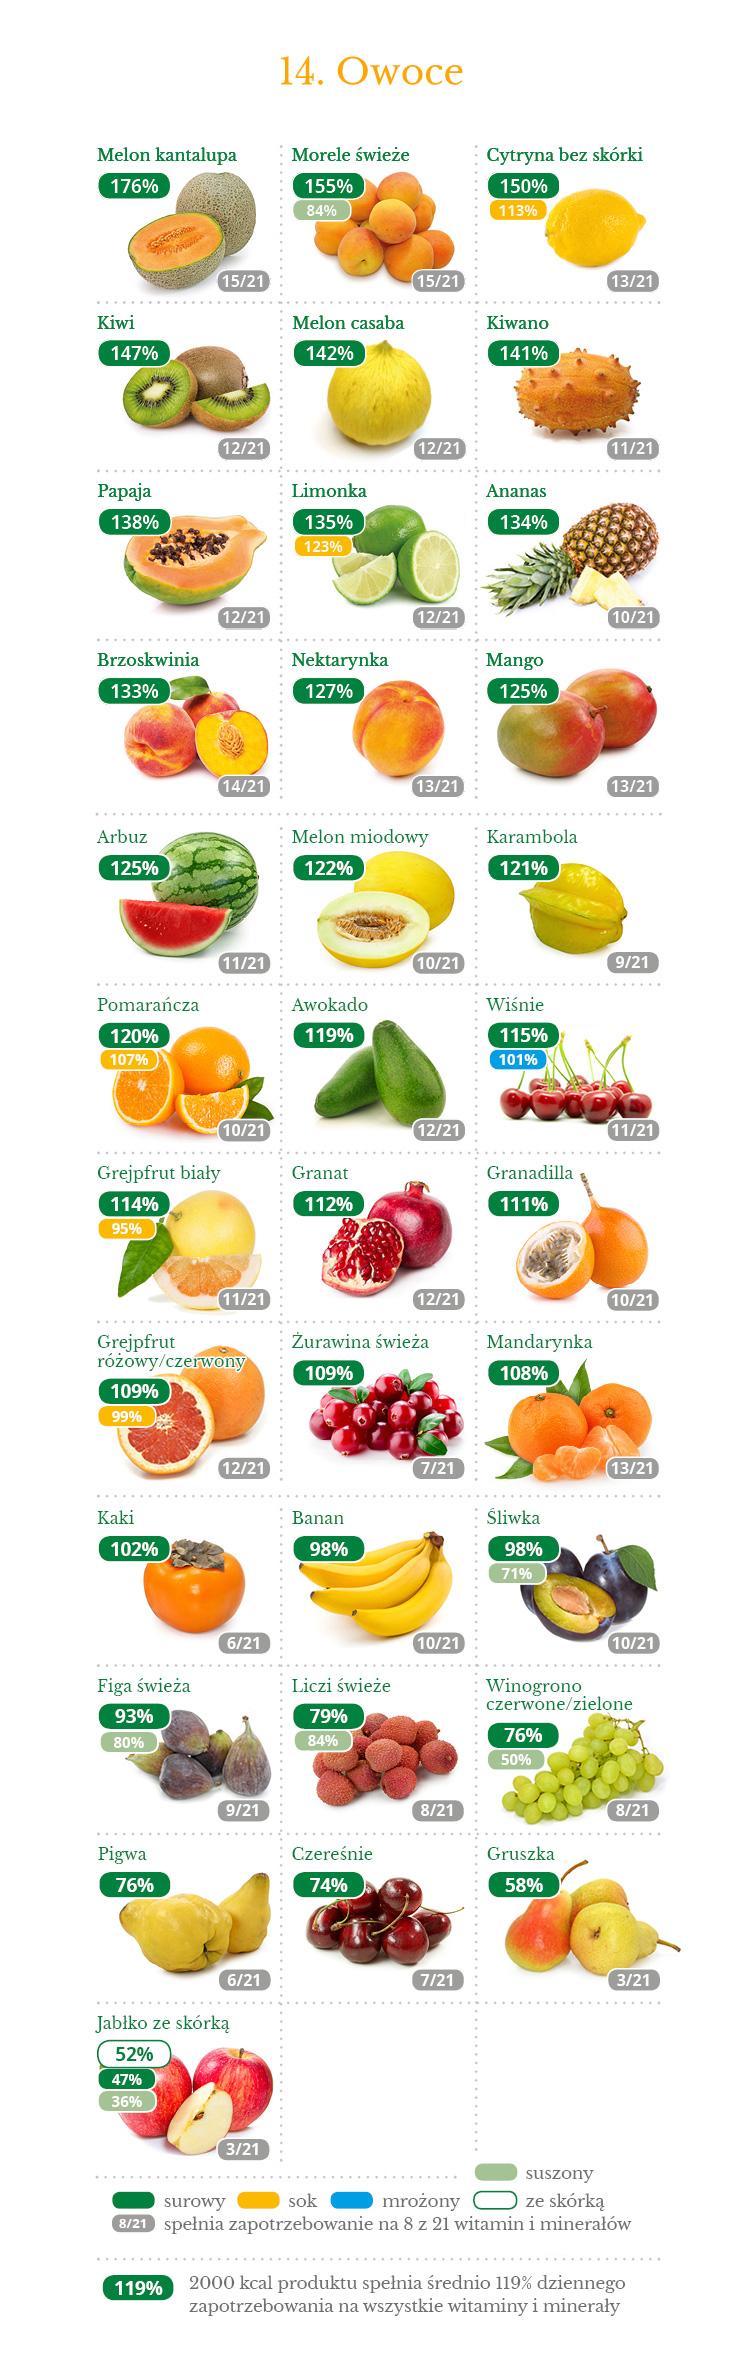 14_gestosc_witamin_mineralow_owoce